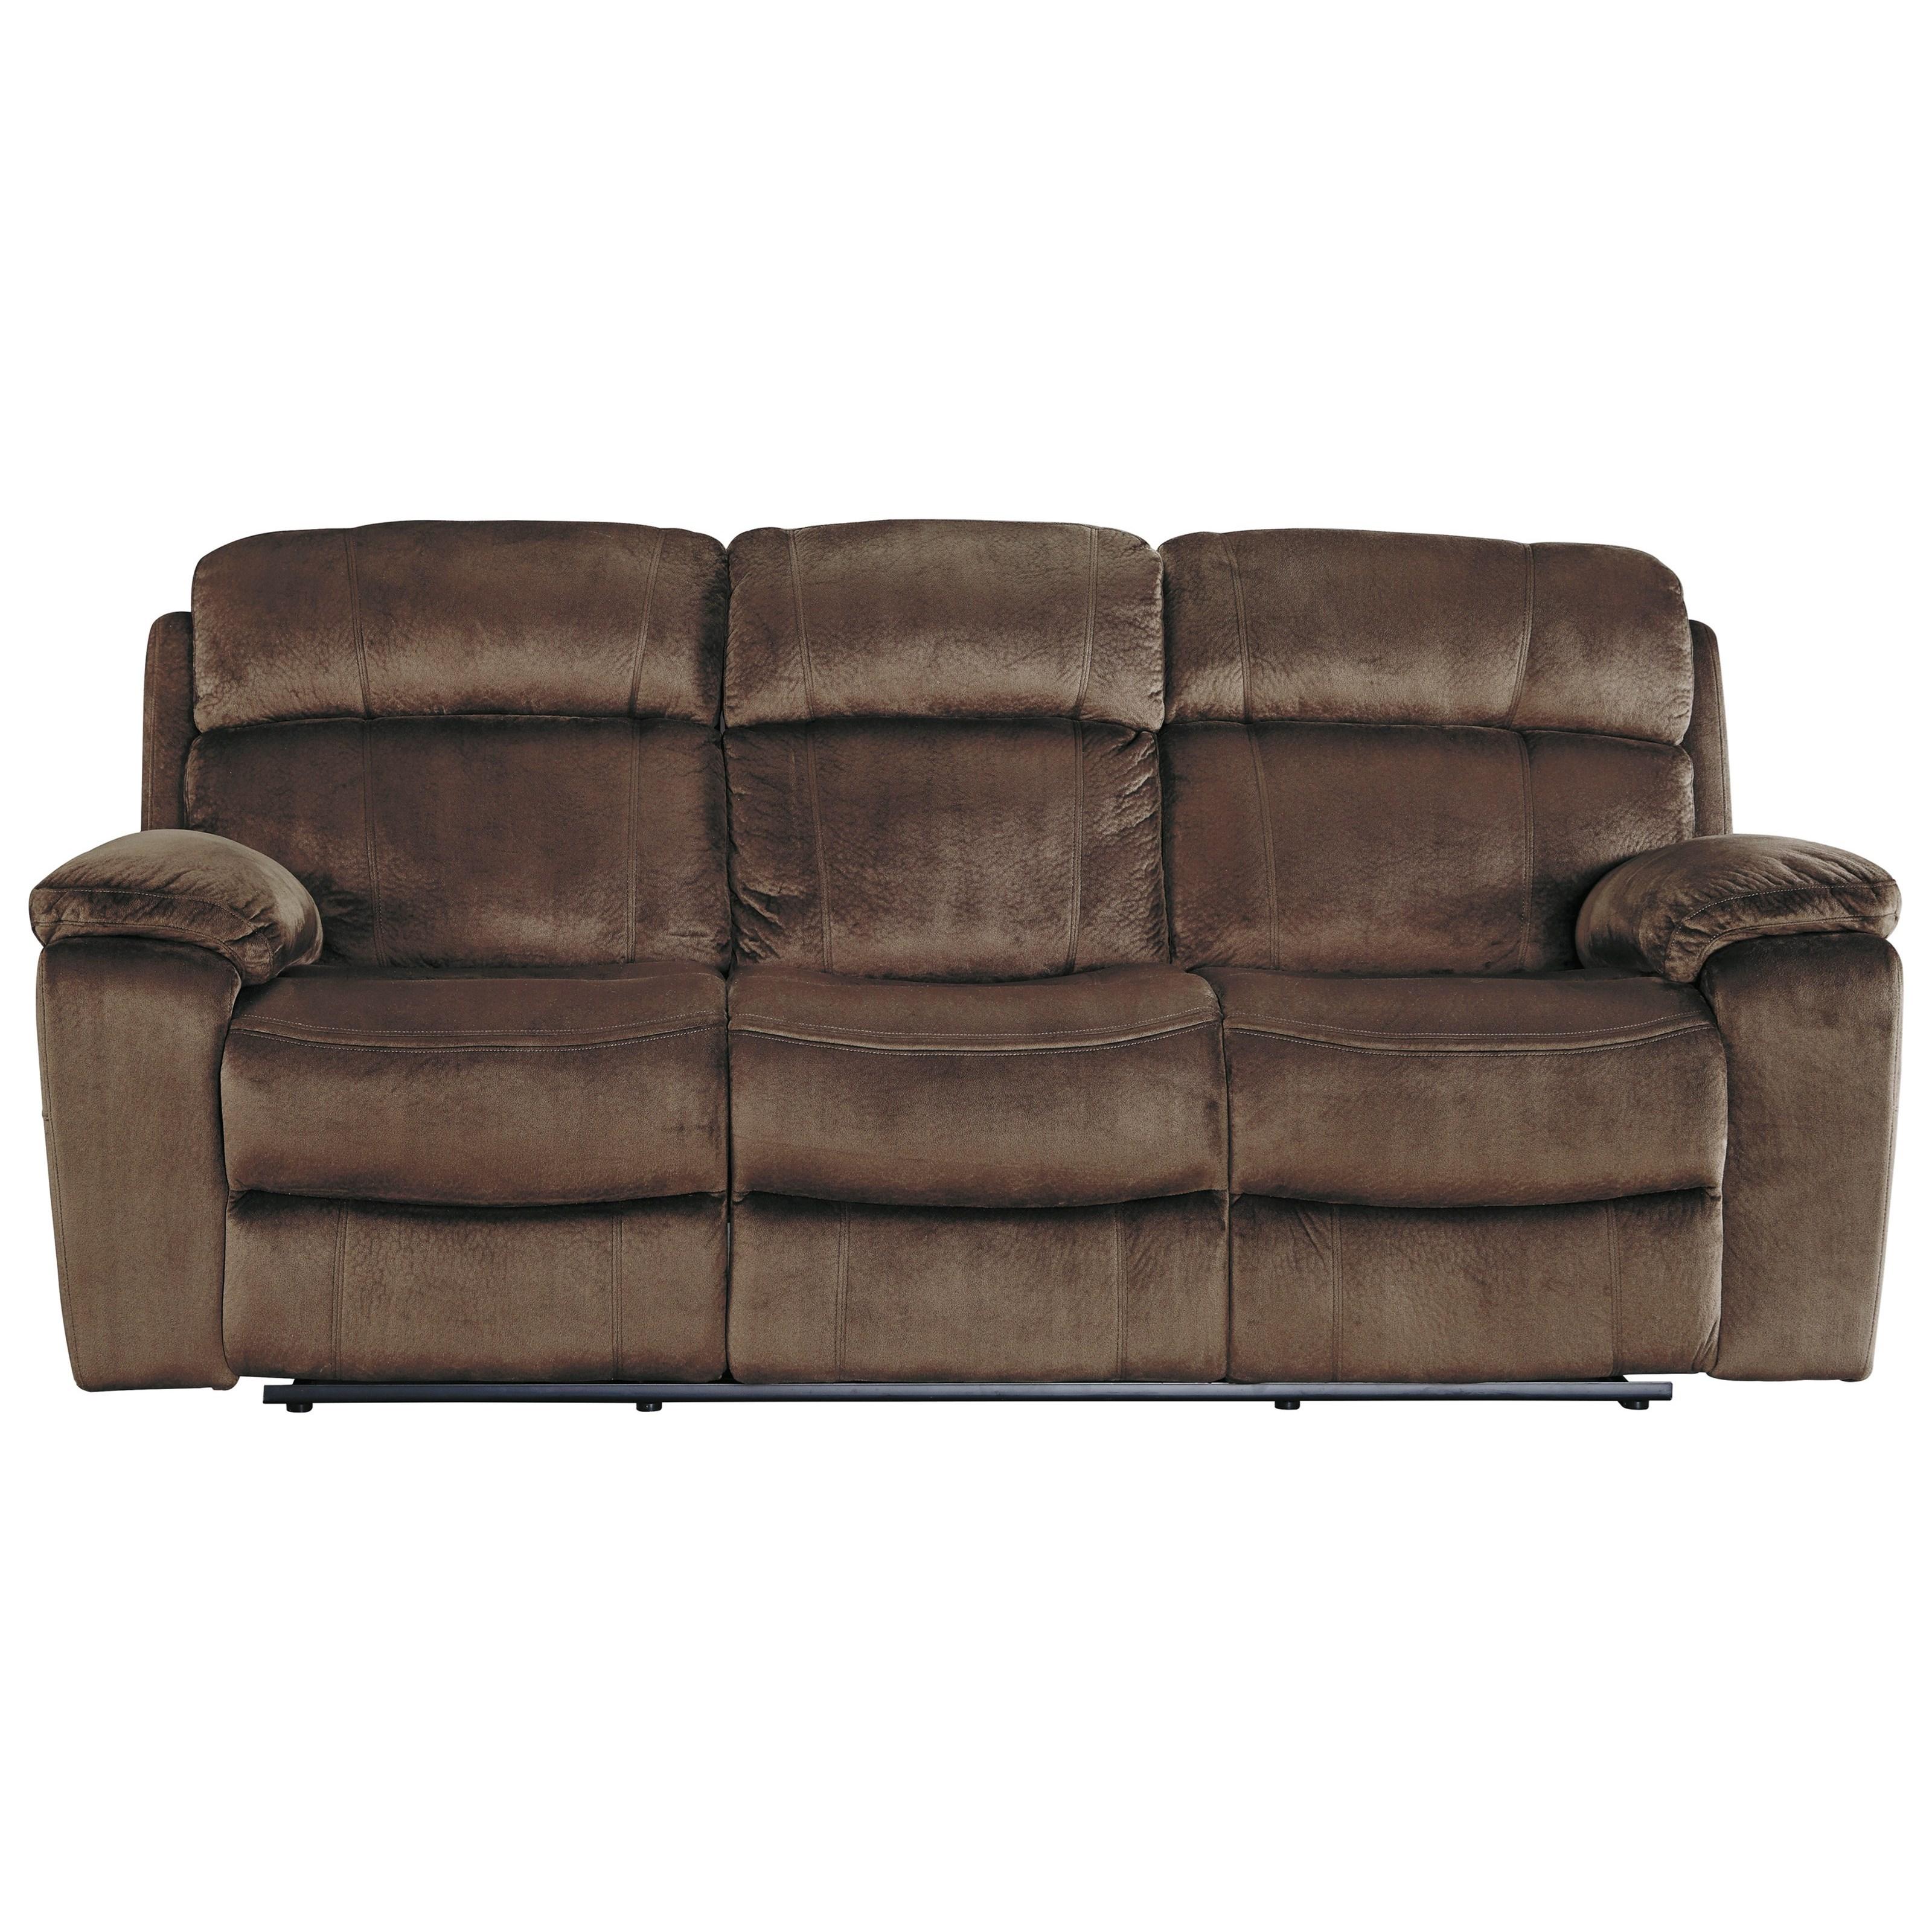 Signature design by ashley uhland 6480315 contemporary - Funda sofa ajustable ...